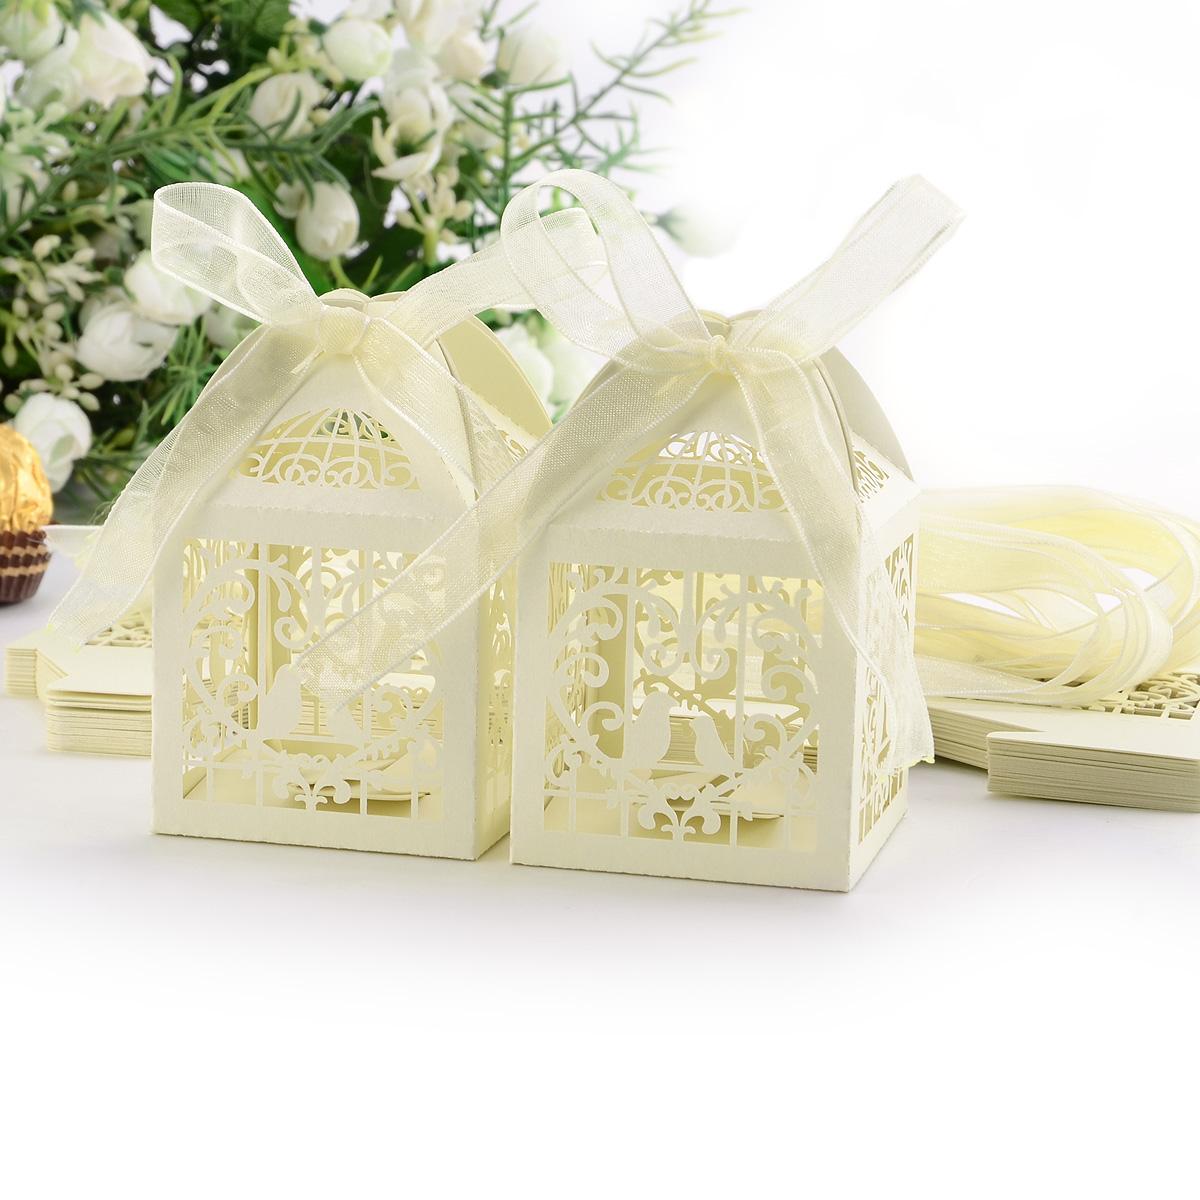 Wedding Gift Boxes Australia : ... Bride Wedding Bomboniere Ribbon Boxes Favor Guest Candy Gift eBay